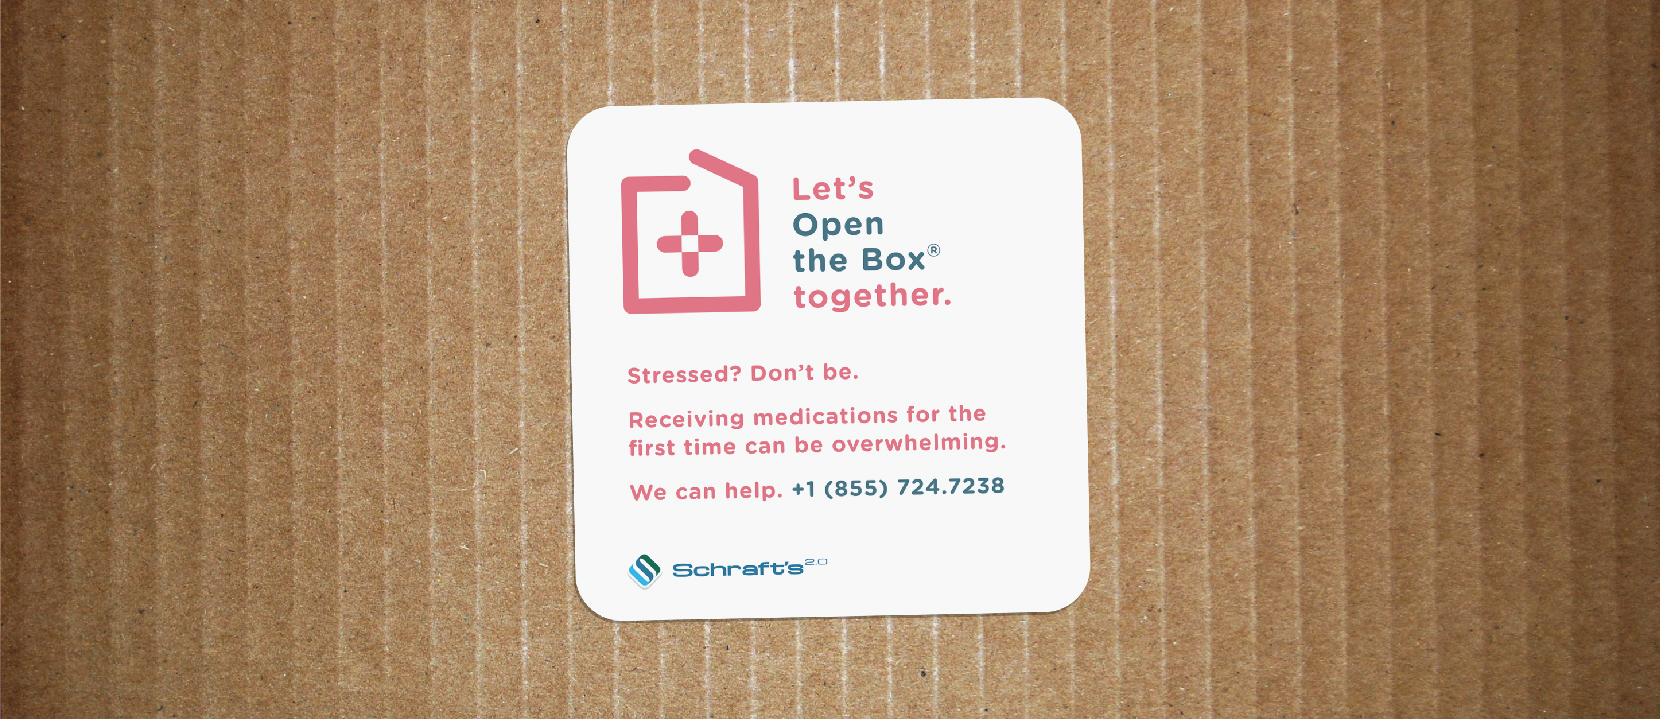 cardboard mockup-05.jpg